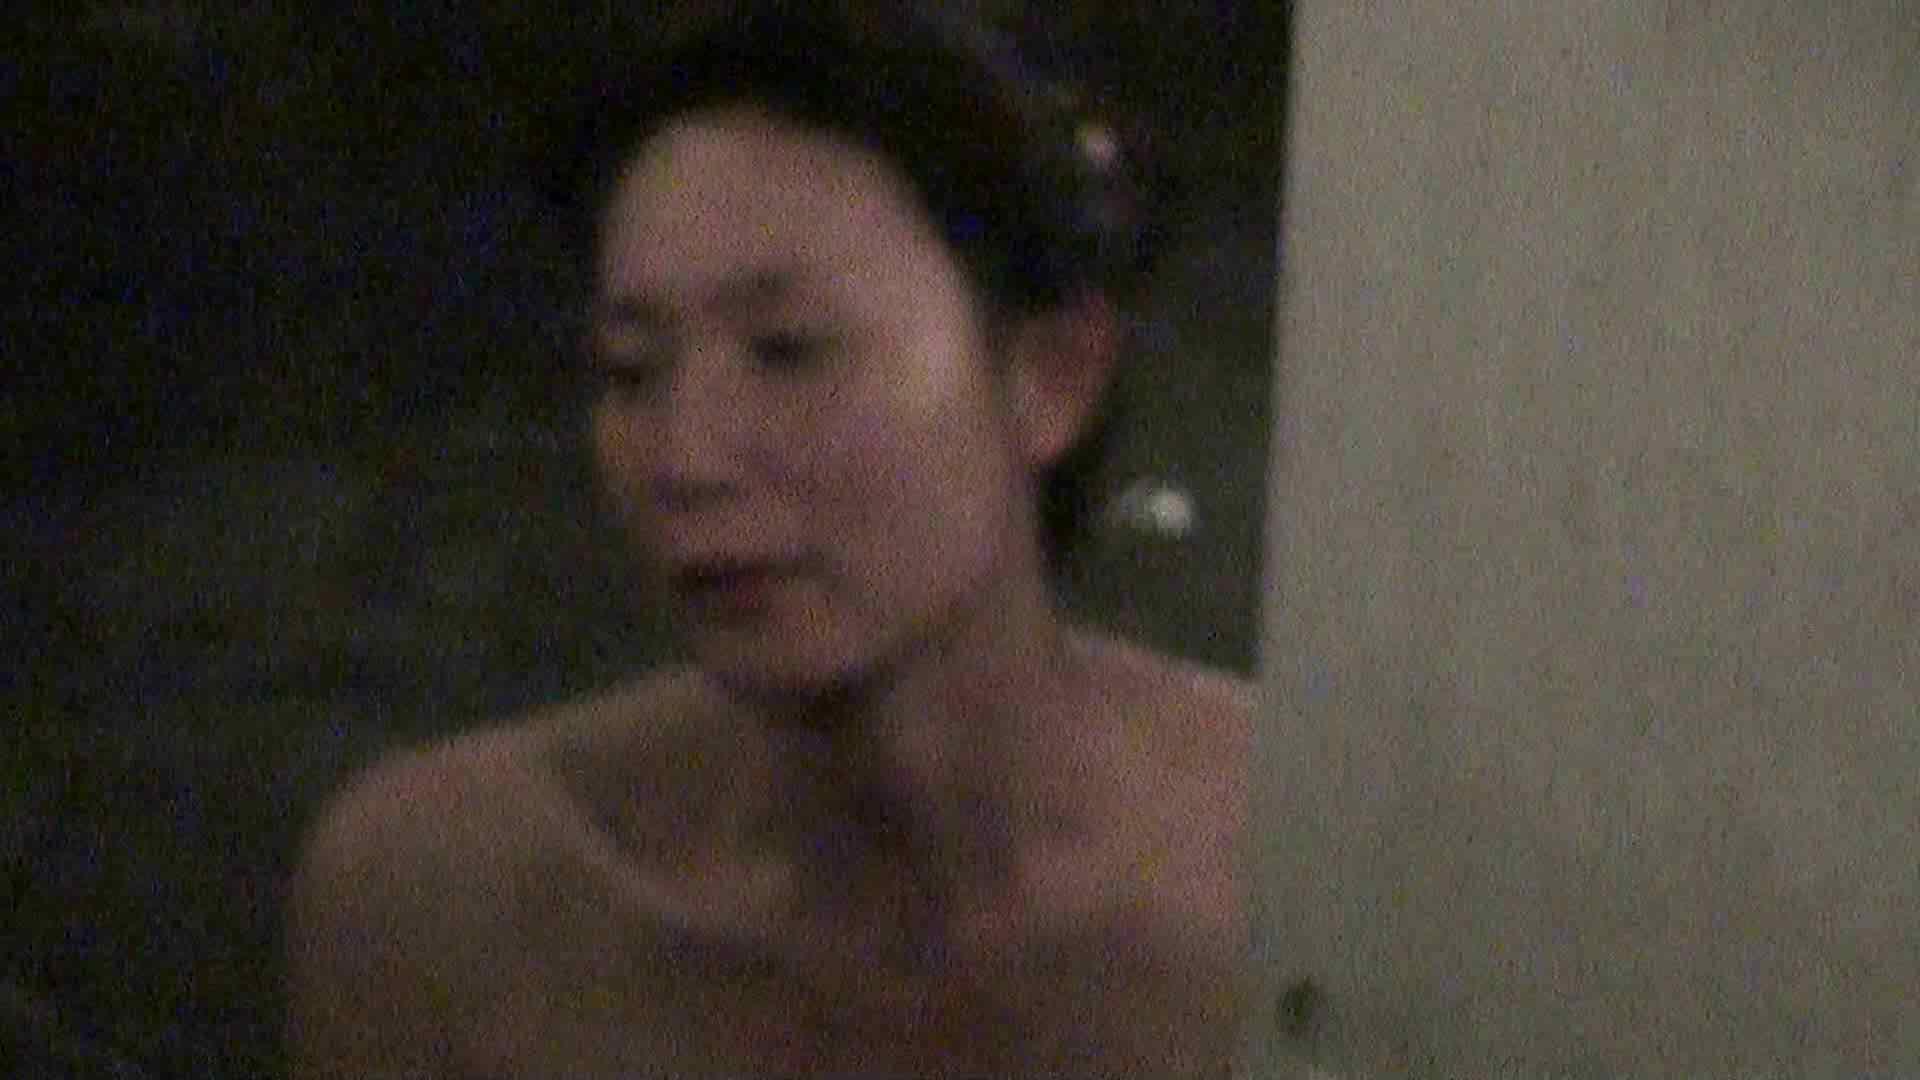 Aquaな露天風呂Vol.367 盗撮 | HなOL  96pic 35